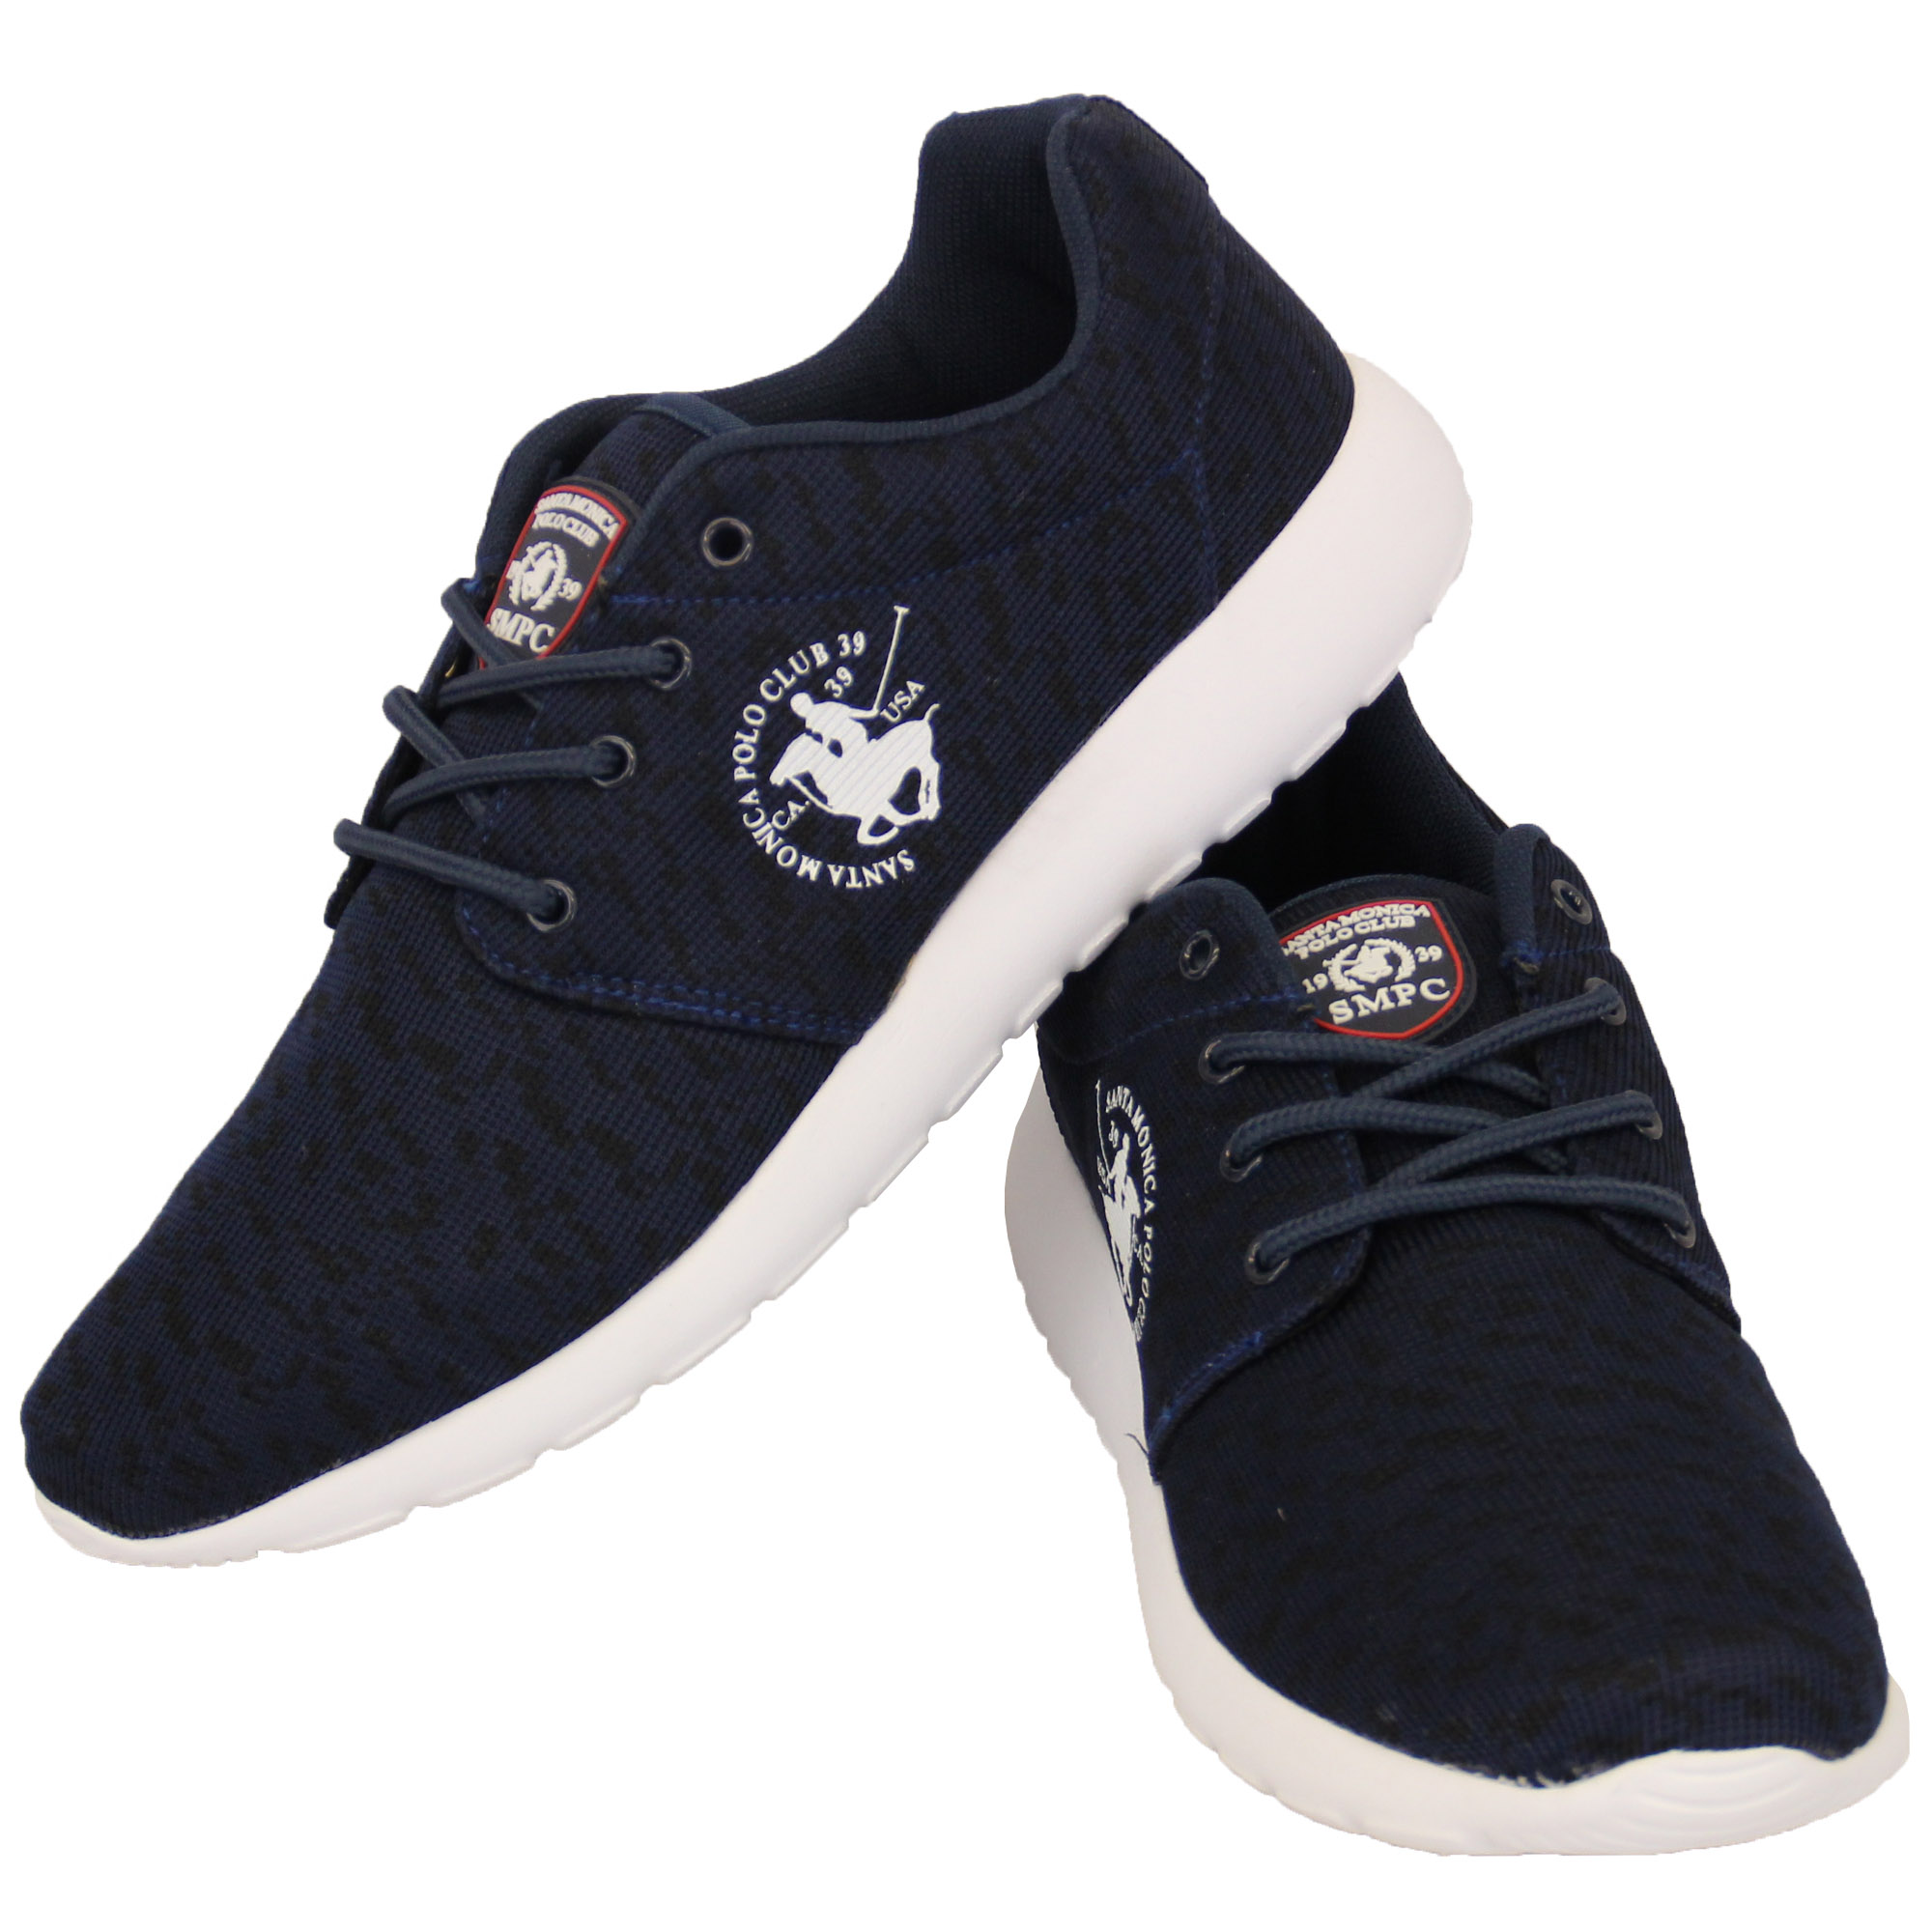 mens trainers santa polo club shoes lace up pumps